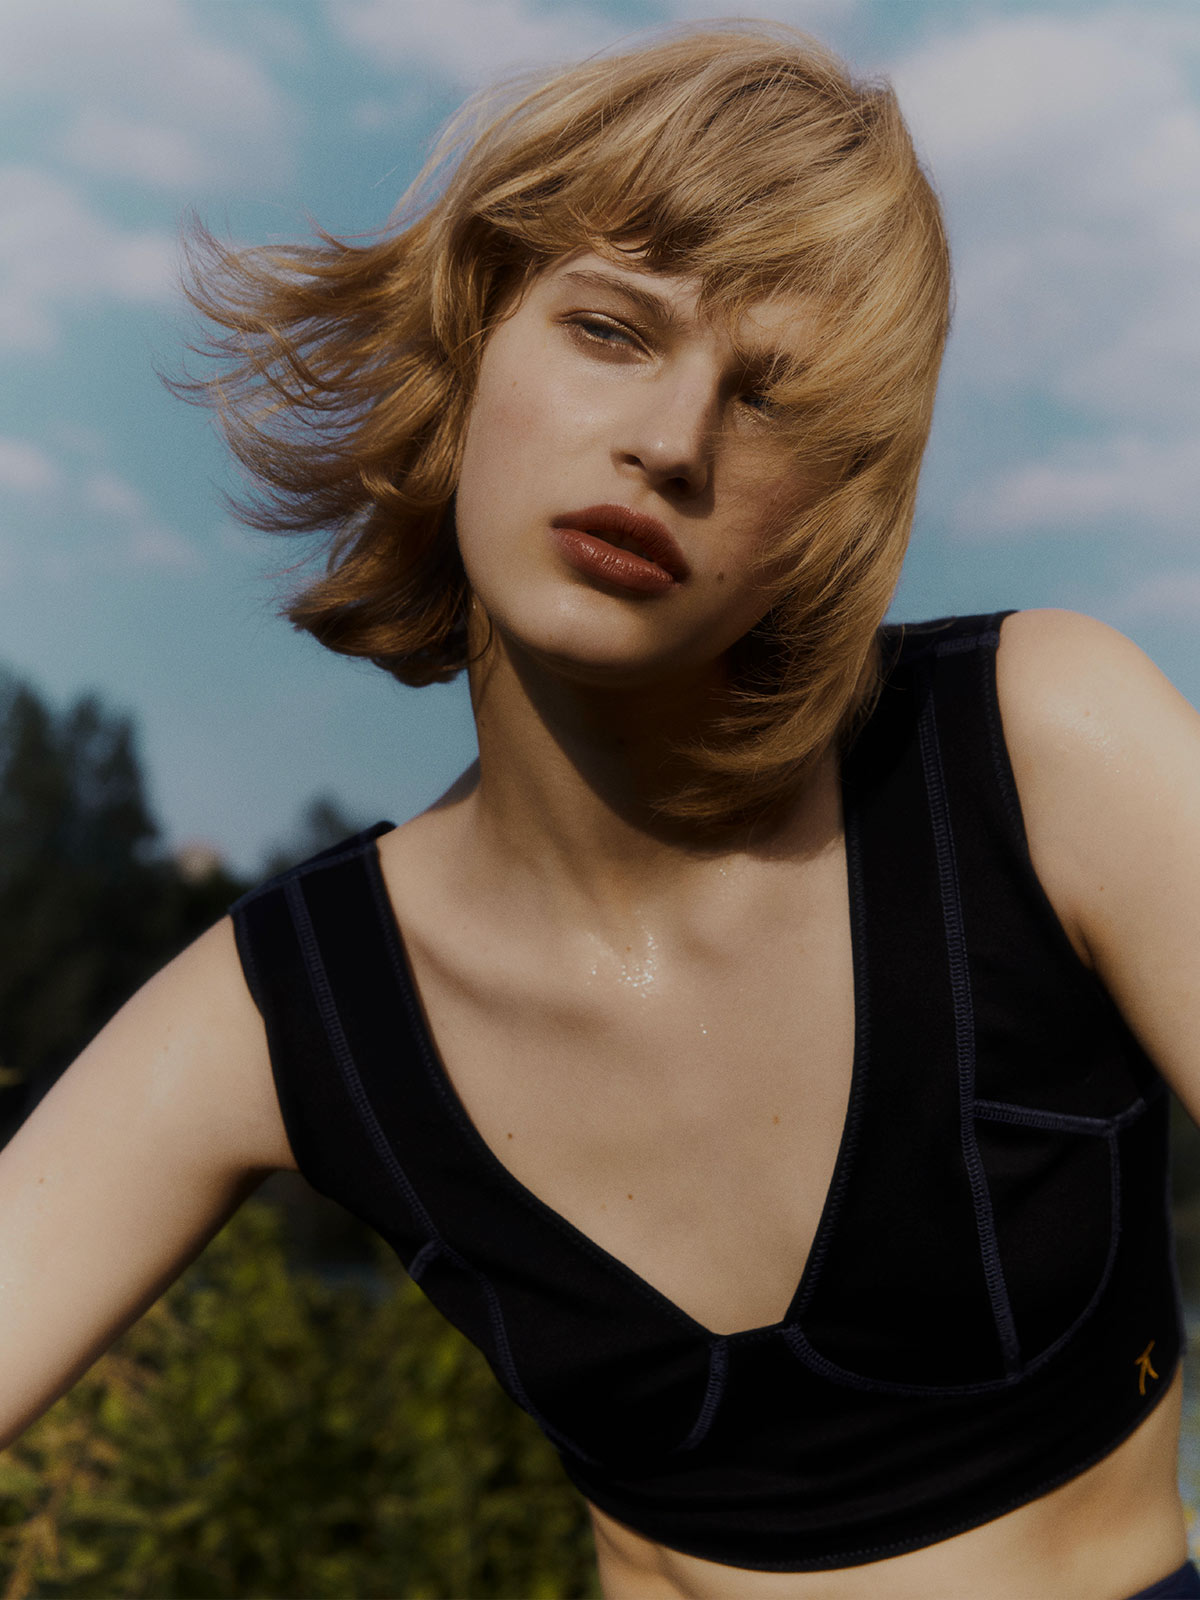 Photographer Antoine Harinthe and stylist Katerina Zolototrubova explore the transformative beauty of sunlight